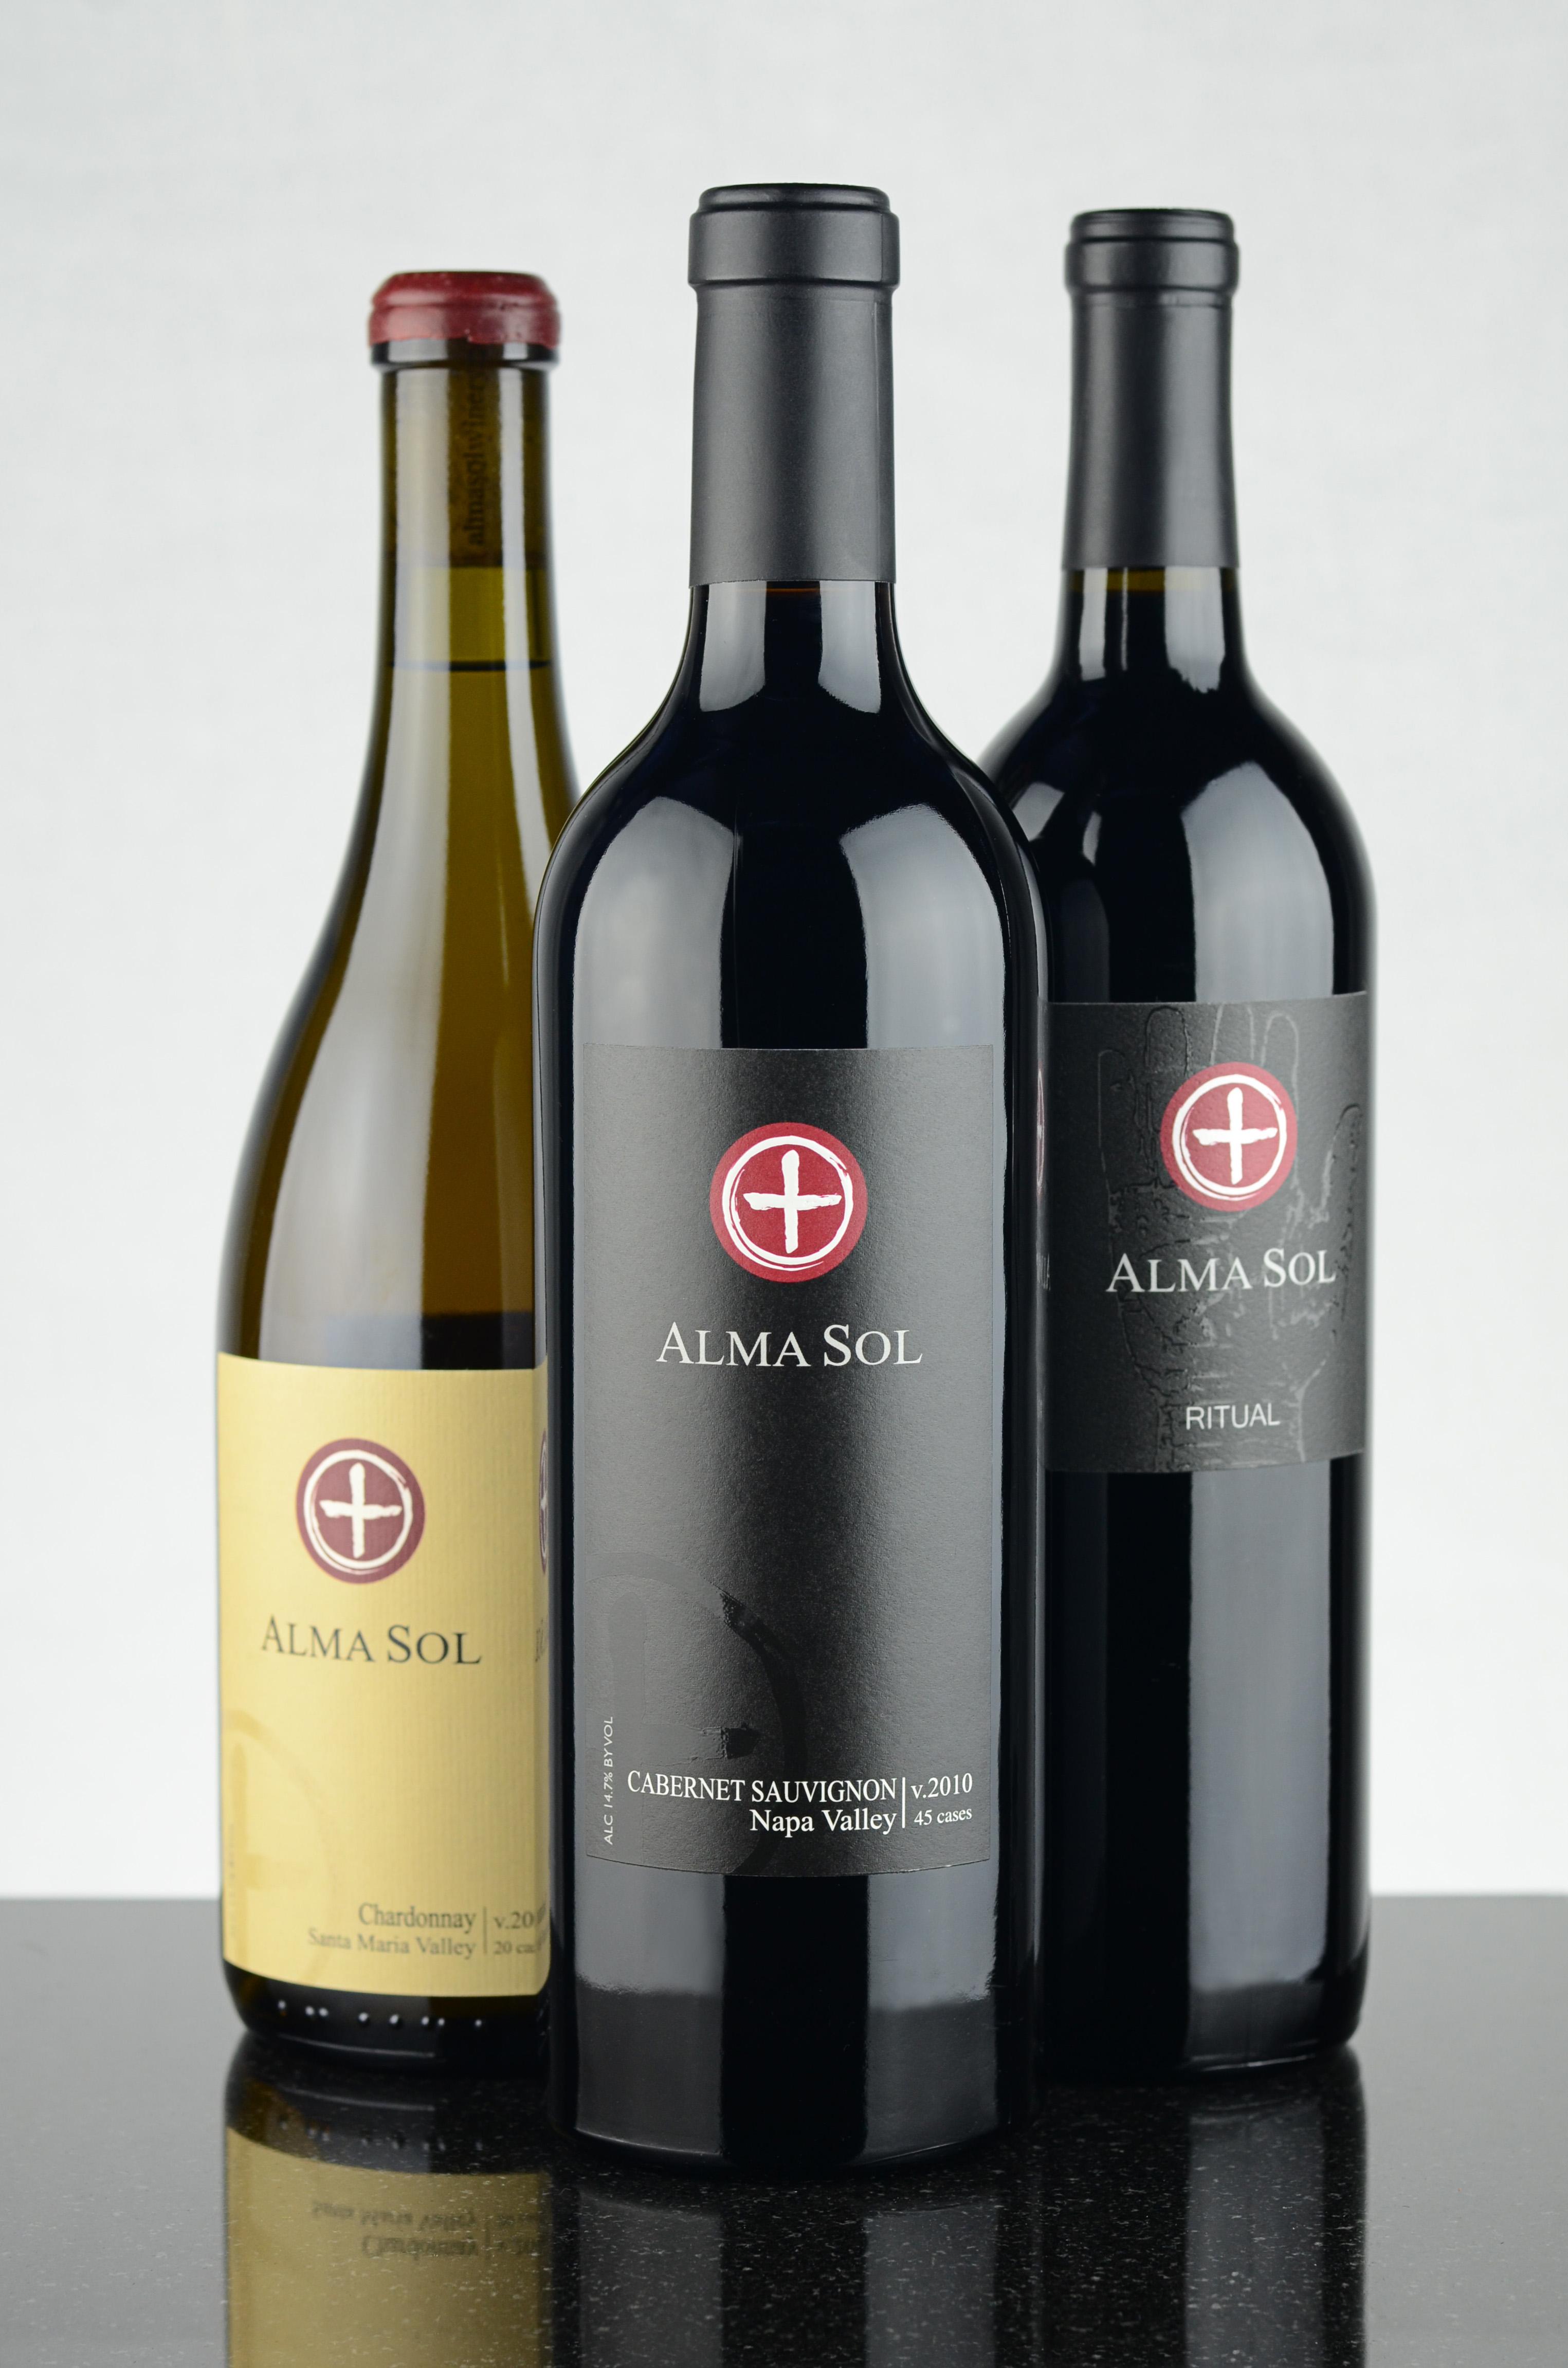 Alma Sol Winery image 2